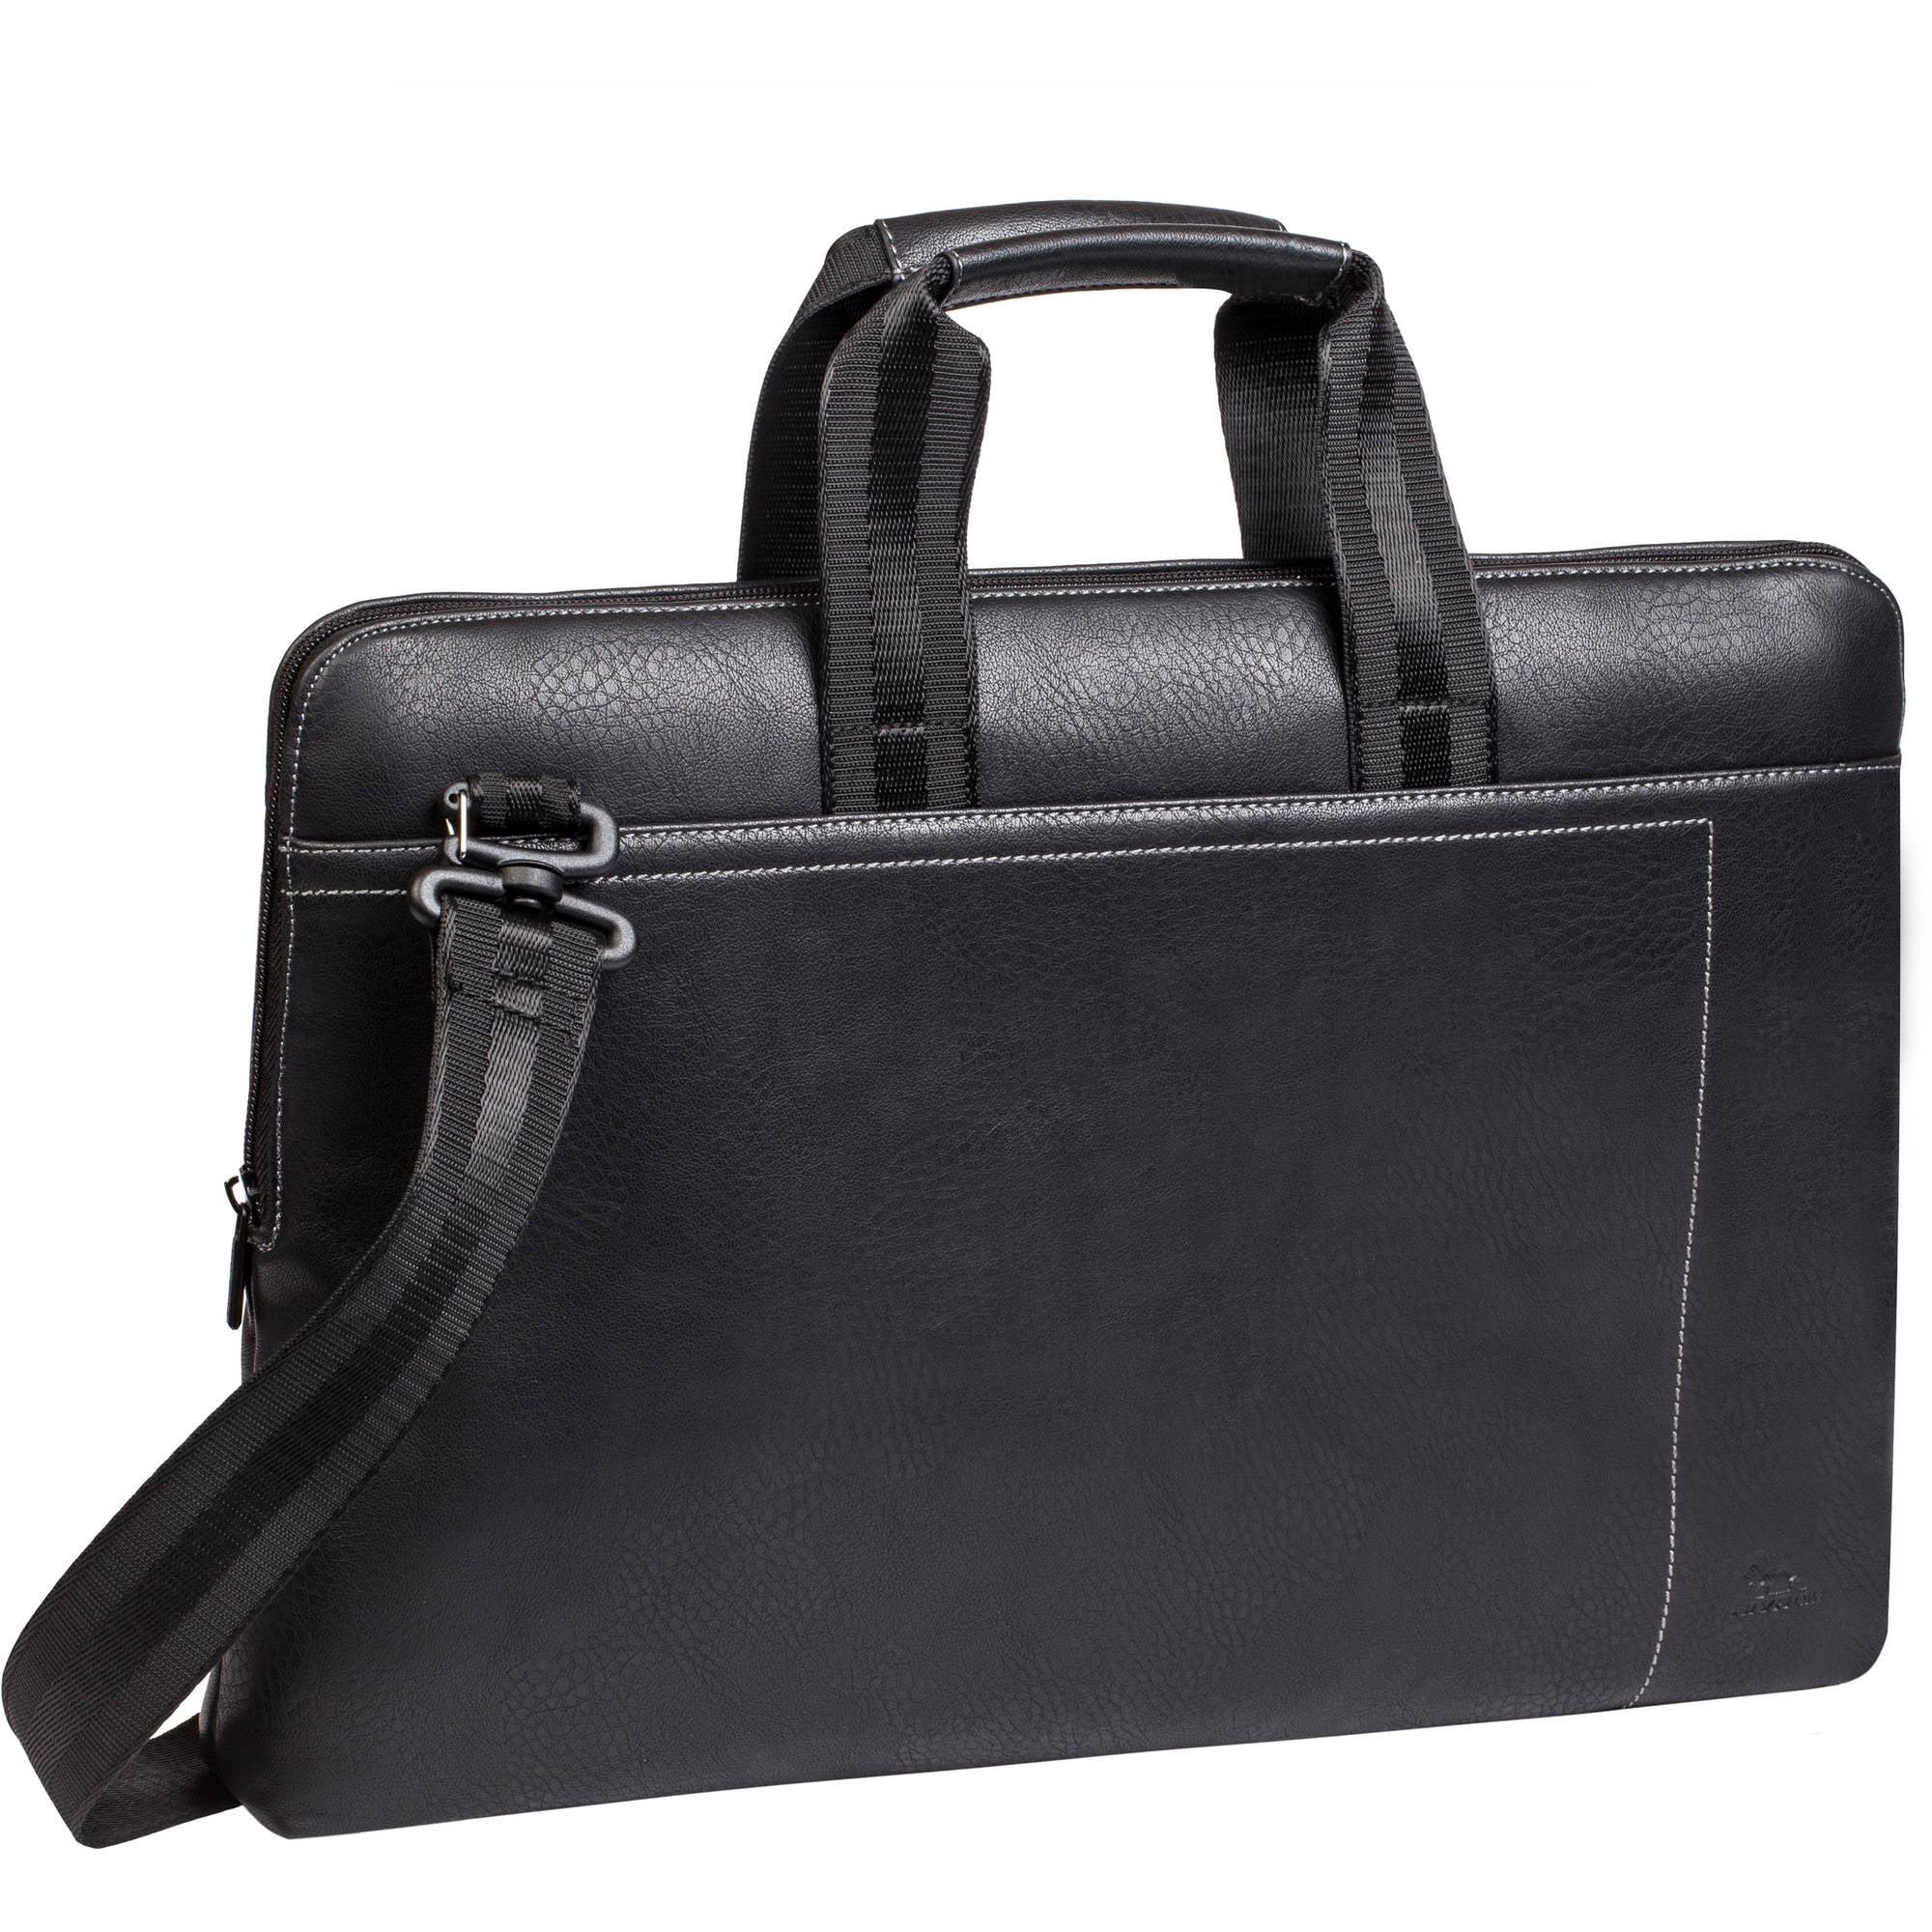 "RIVACASE 15.6"" Laptop Bag 8930, Black"